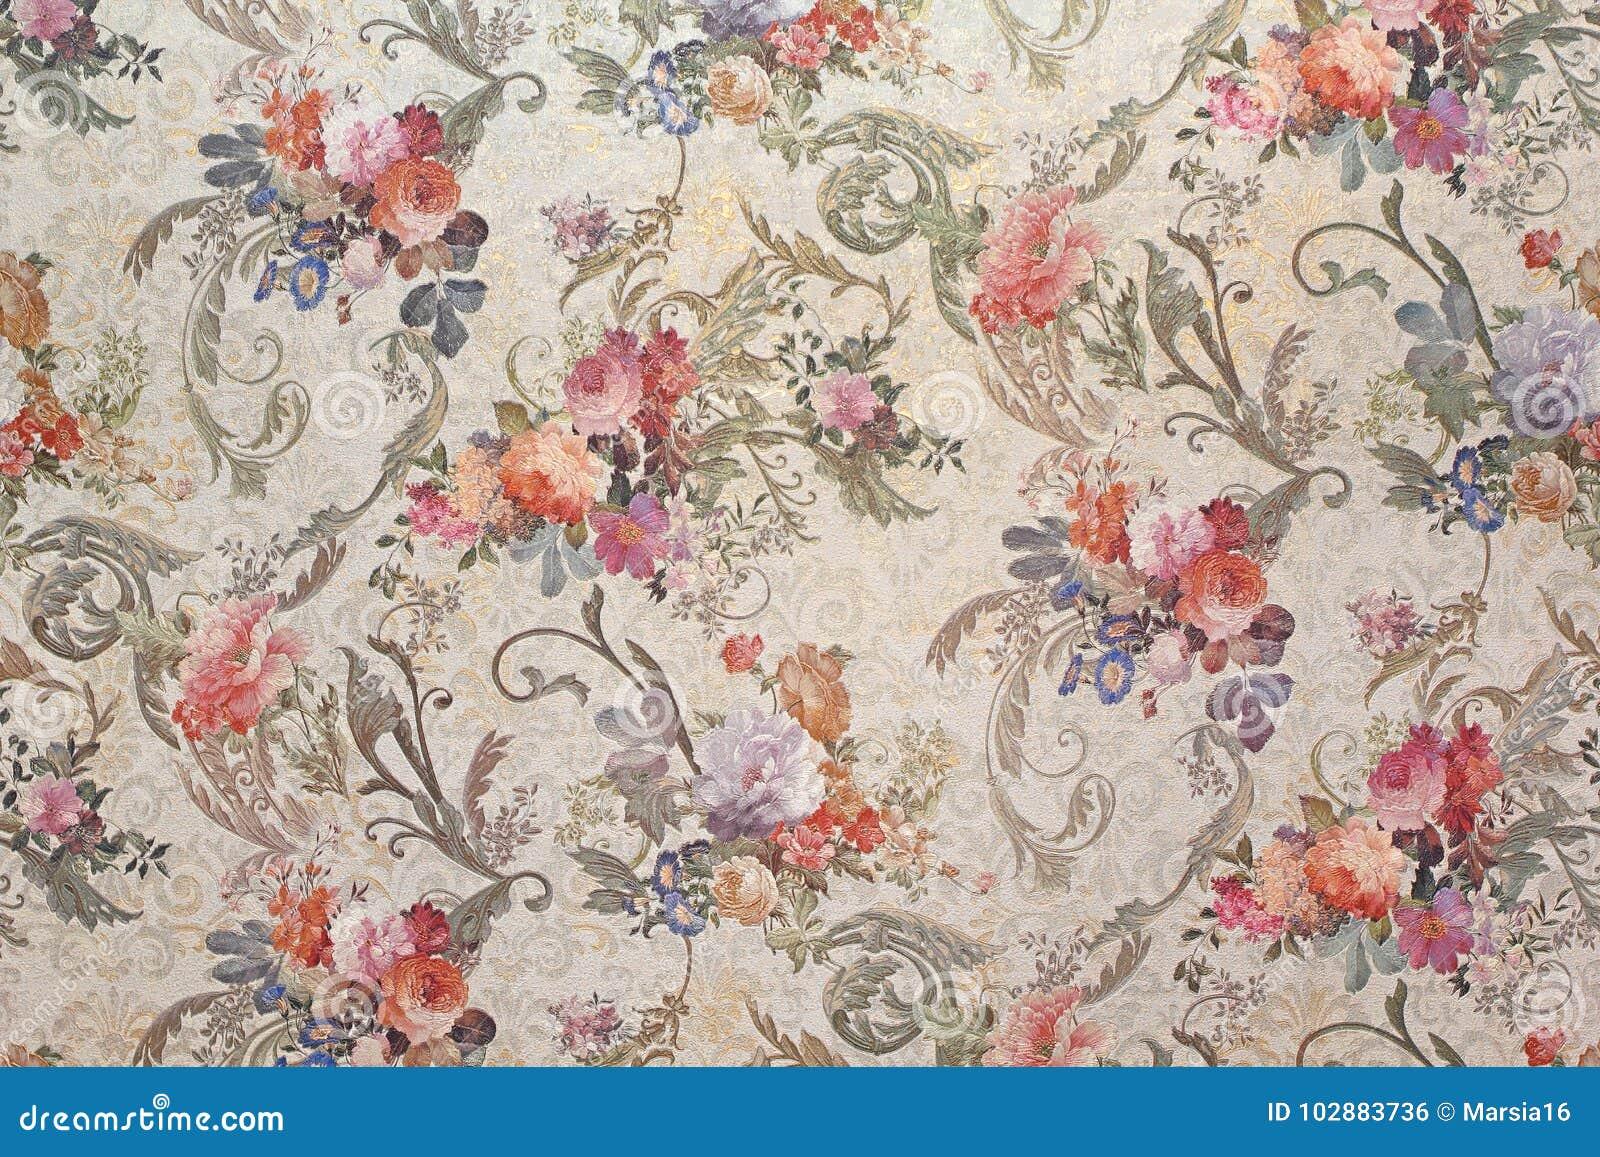 vintage floral wallpaper stock photo